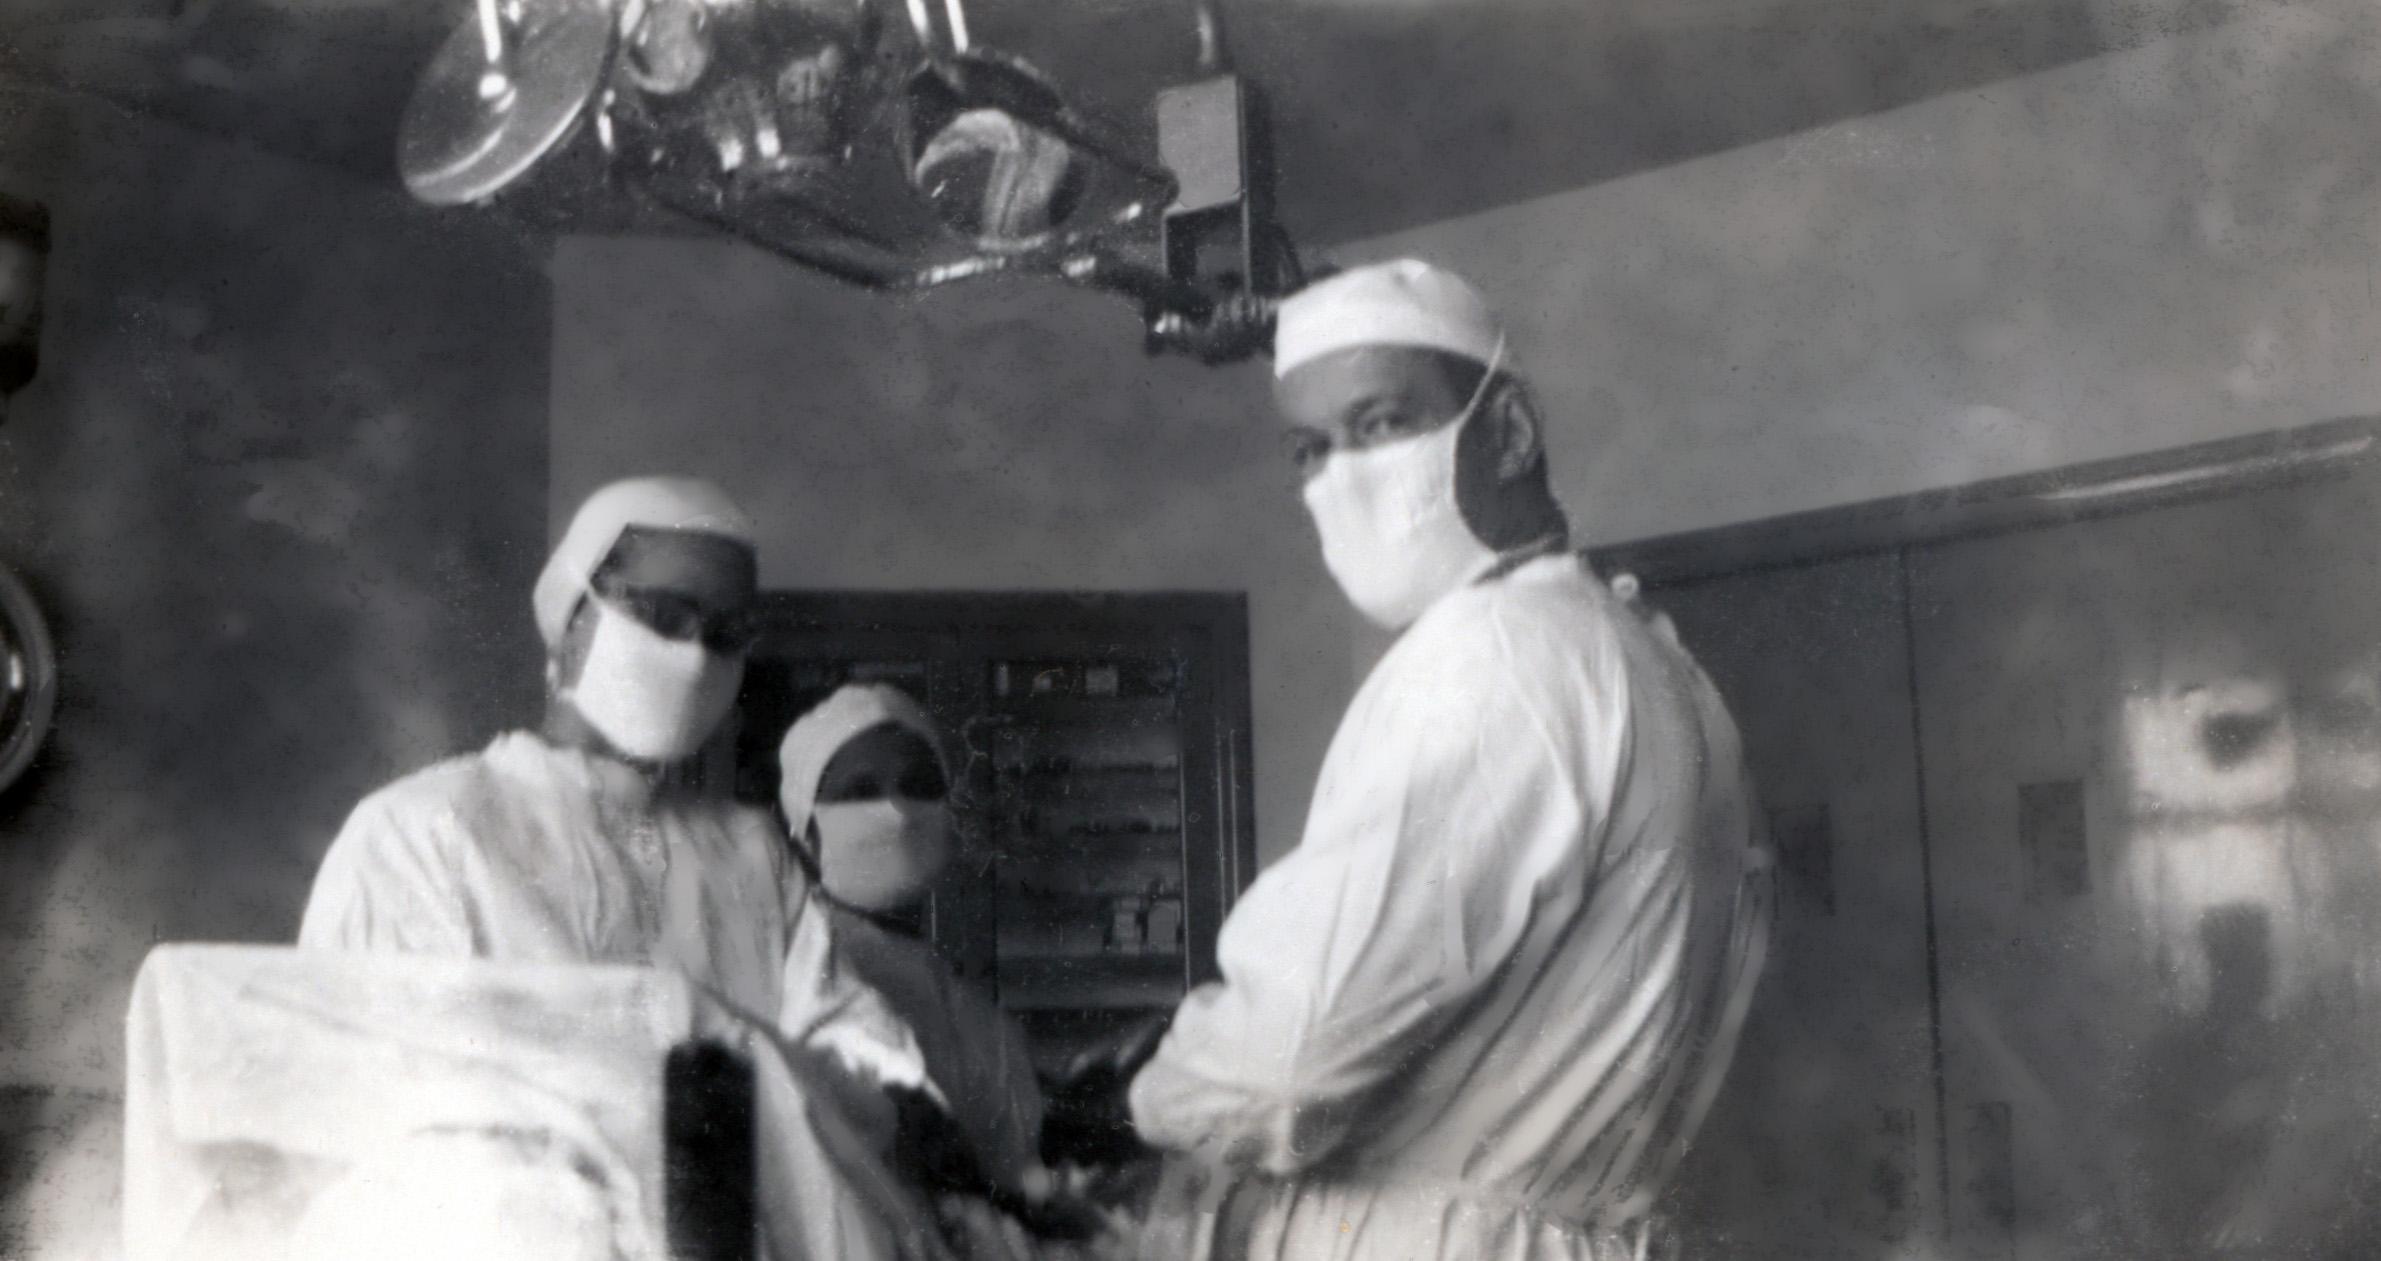 File:Mayo-Clinic-OR-1948 jpg - Wikimedia Commons